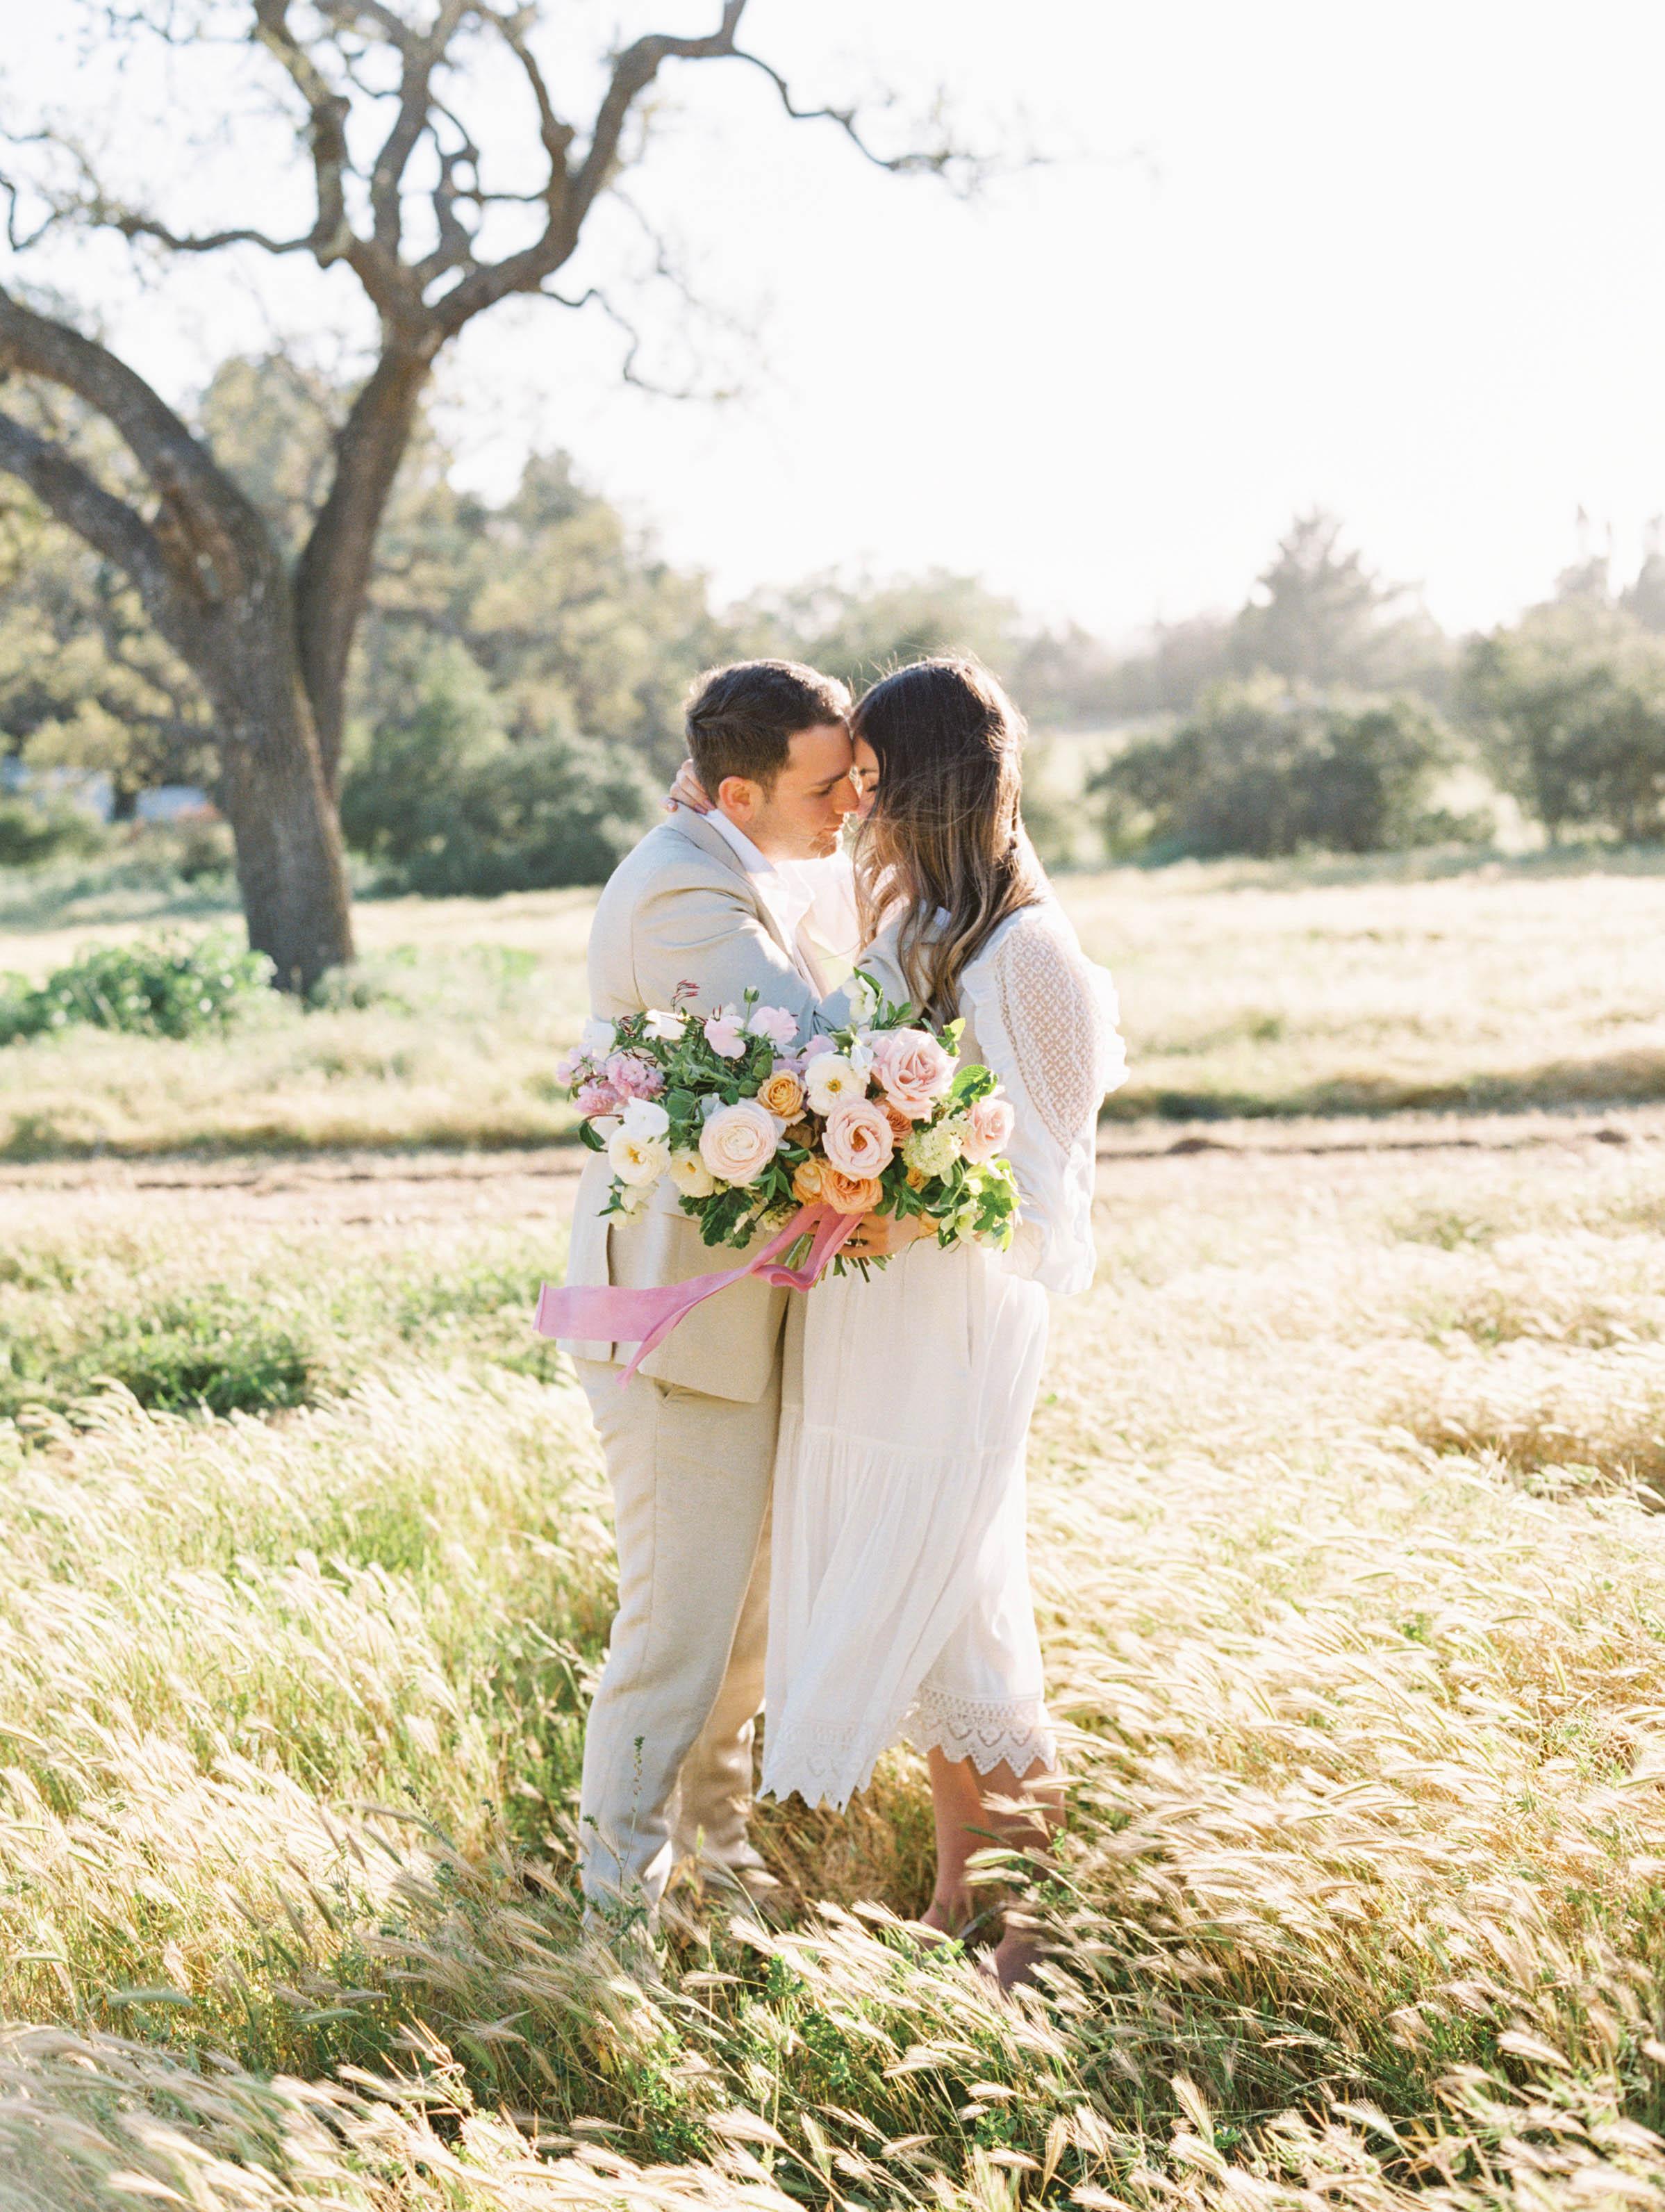 kelsandmichael_wedding_lieffranch-275.jpg